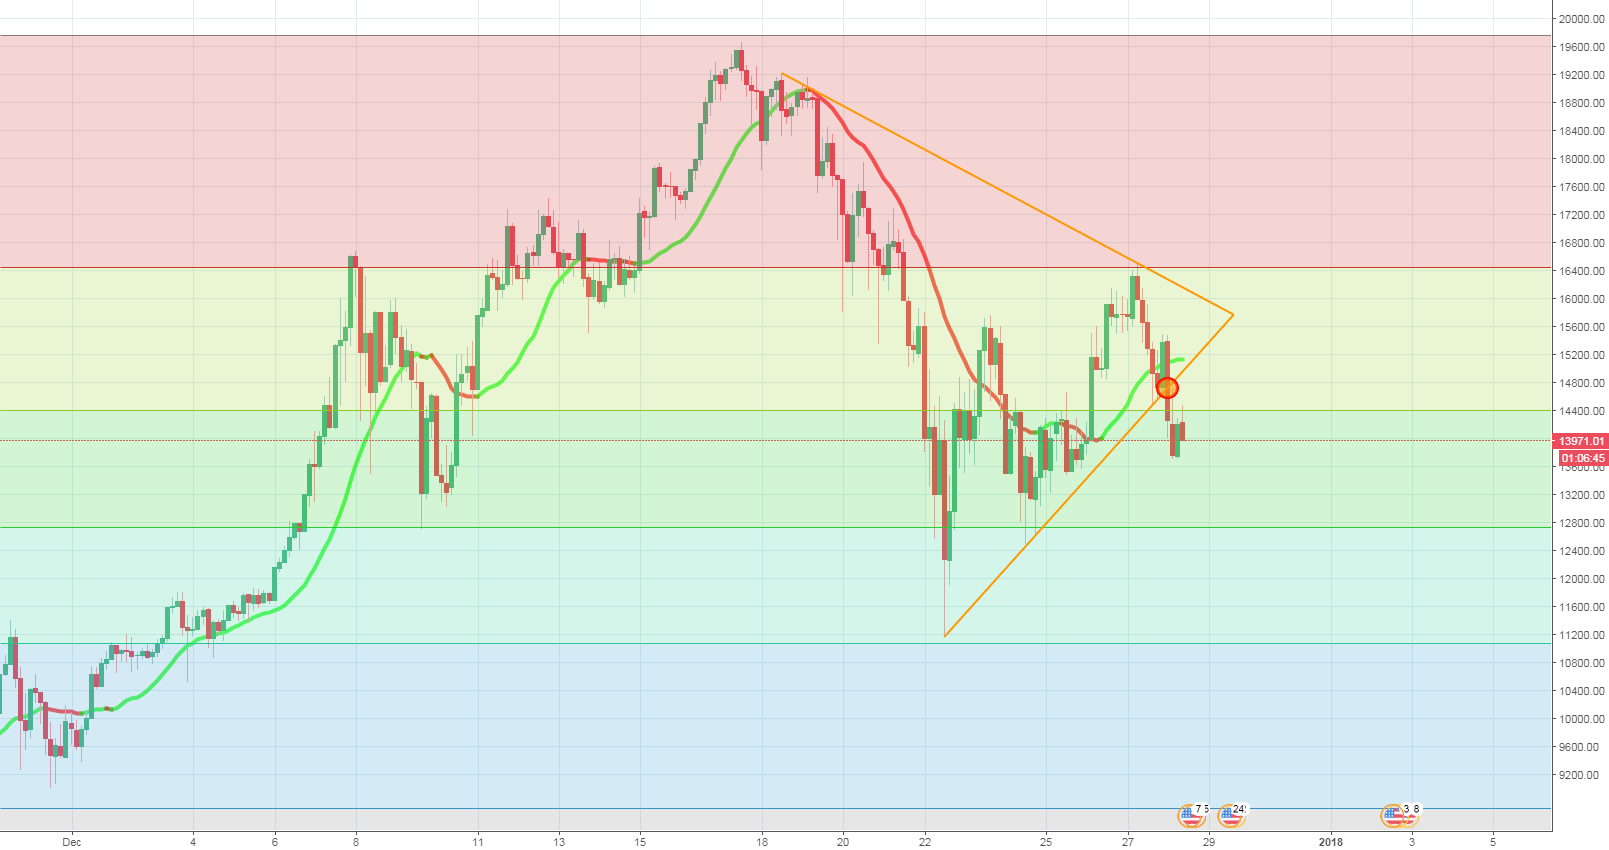 BTC: the triangle has been broken